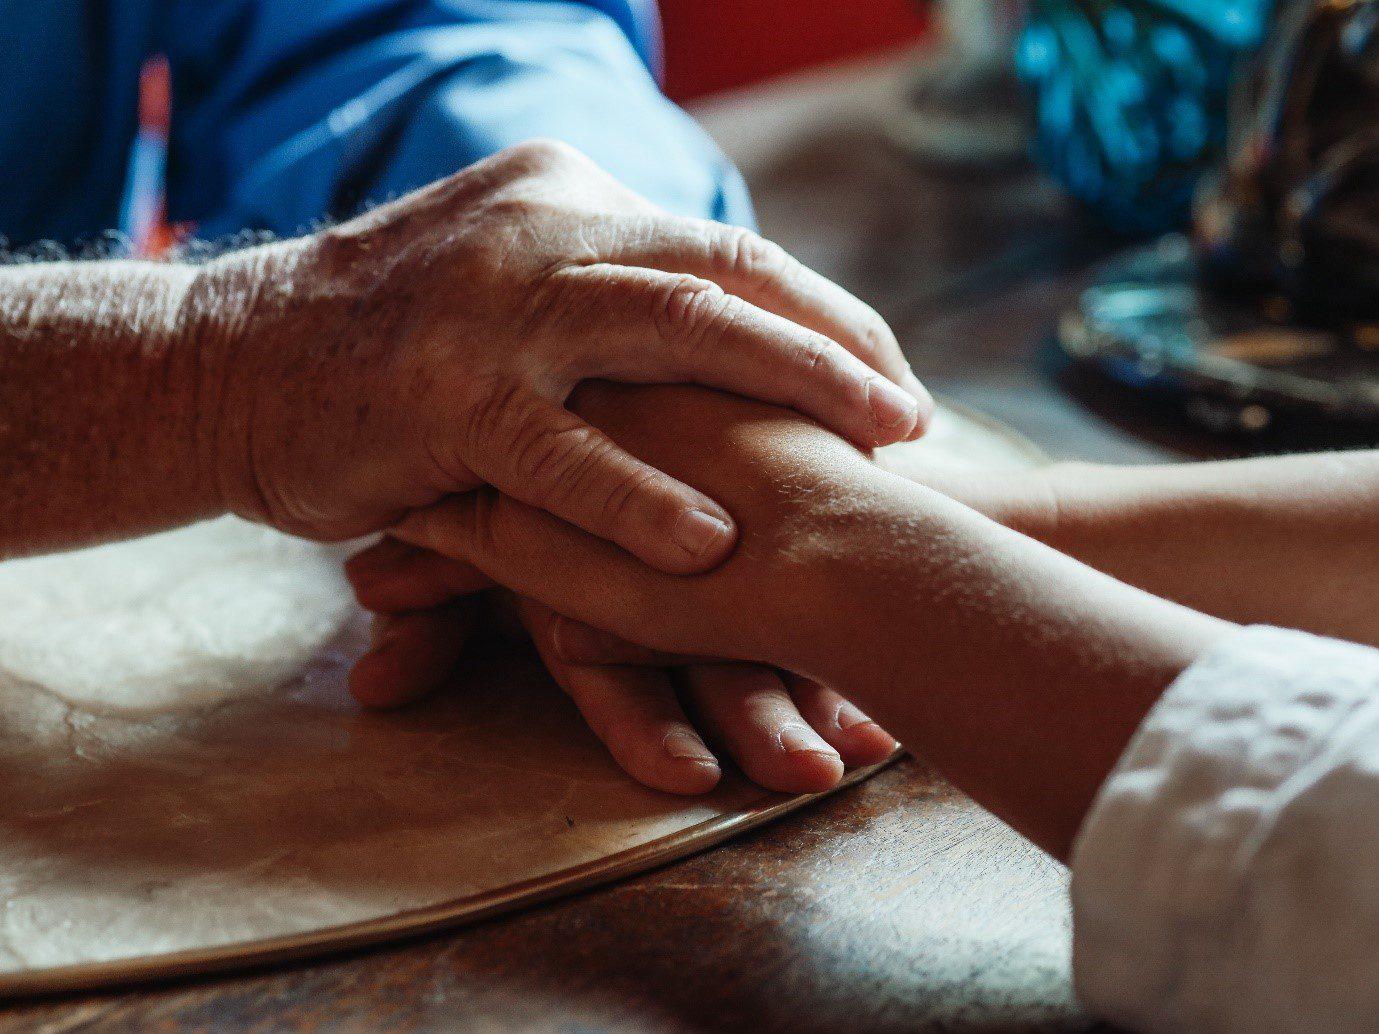 Preventing dementia wandering